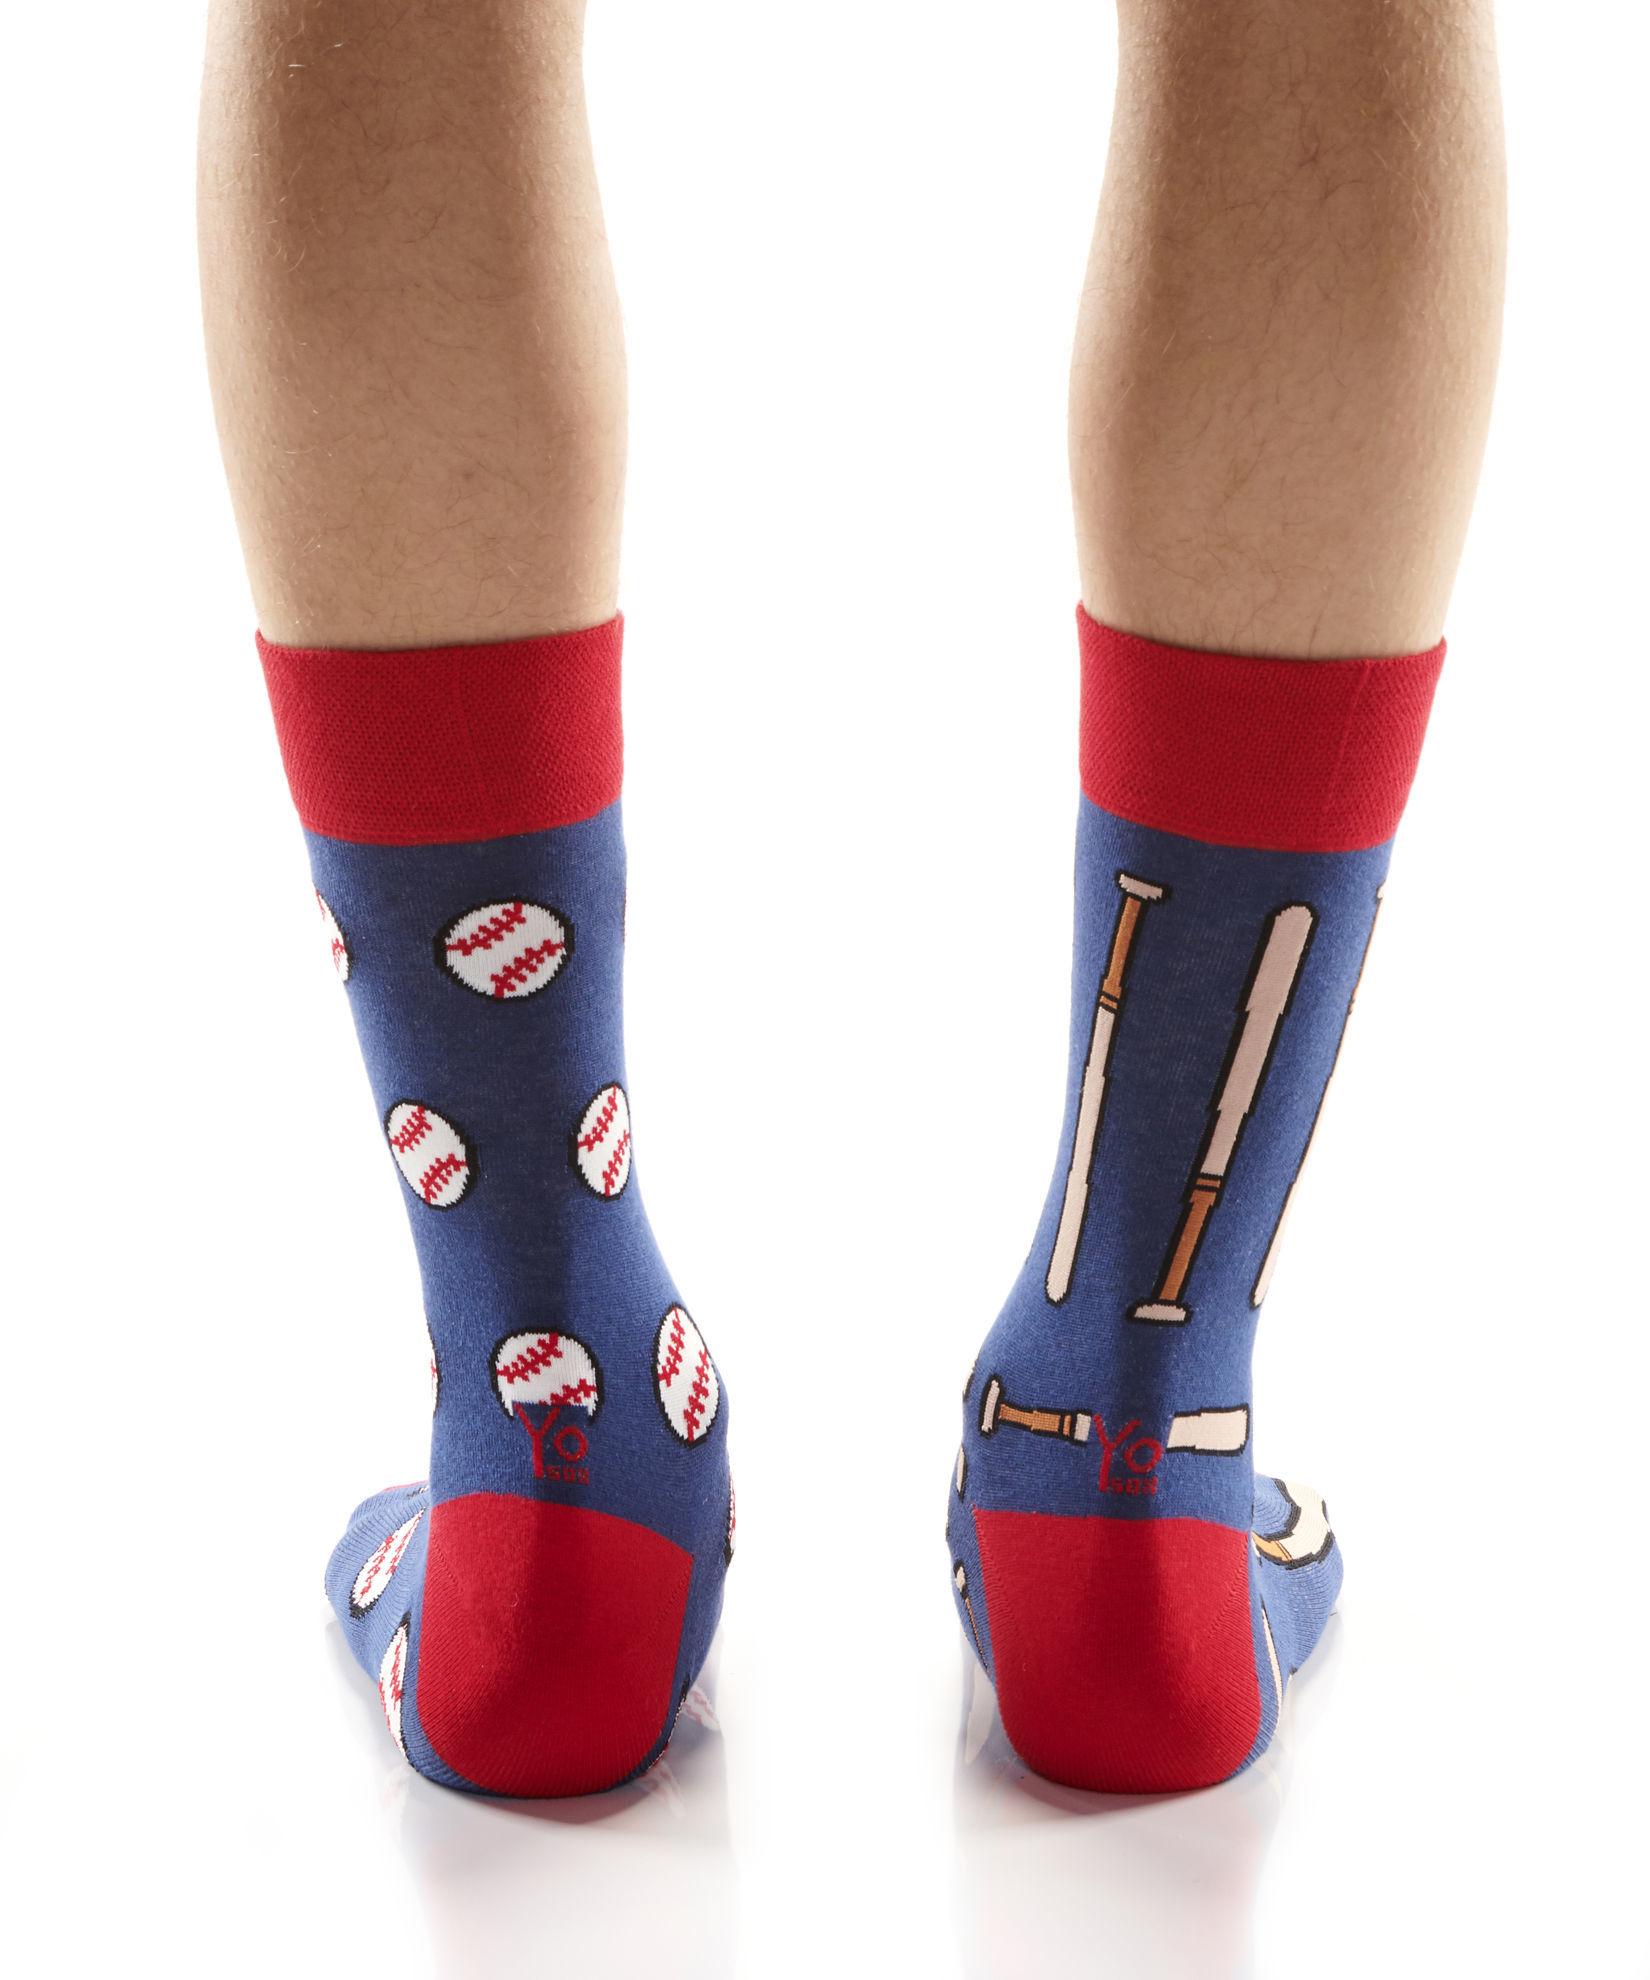 Balls & Bats Men's Crew Socks by Yo Sox